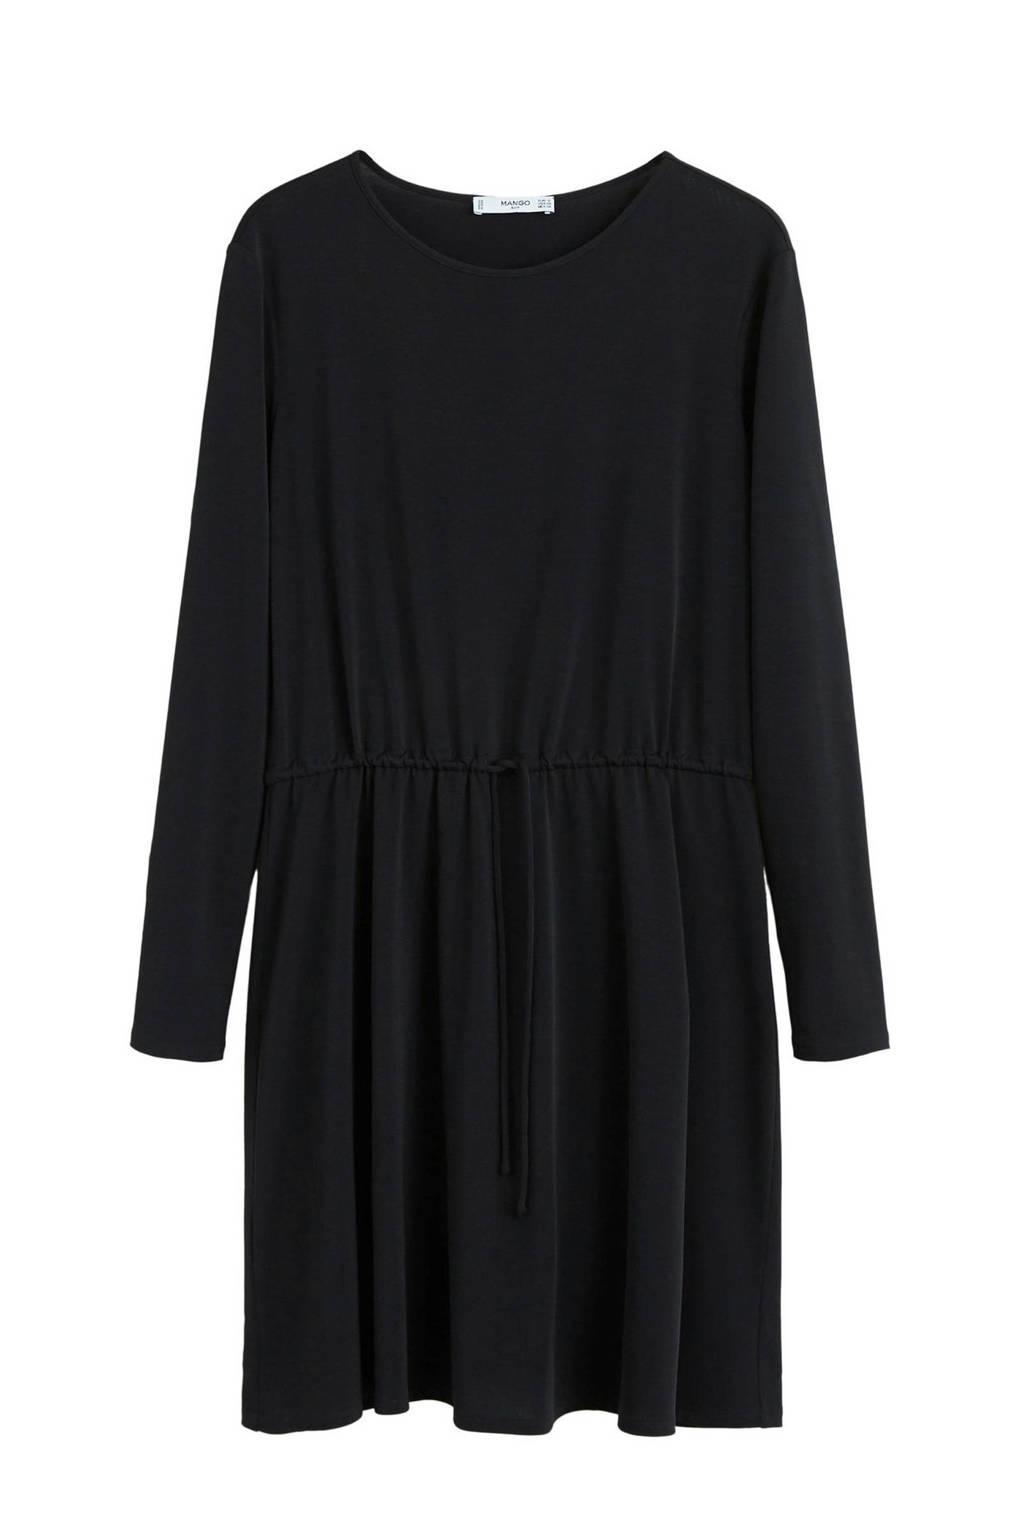 Mango asymmetrishe jurk zwart, Zwart